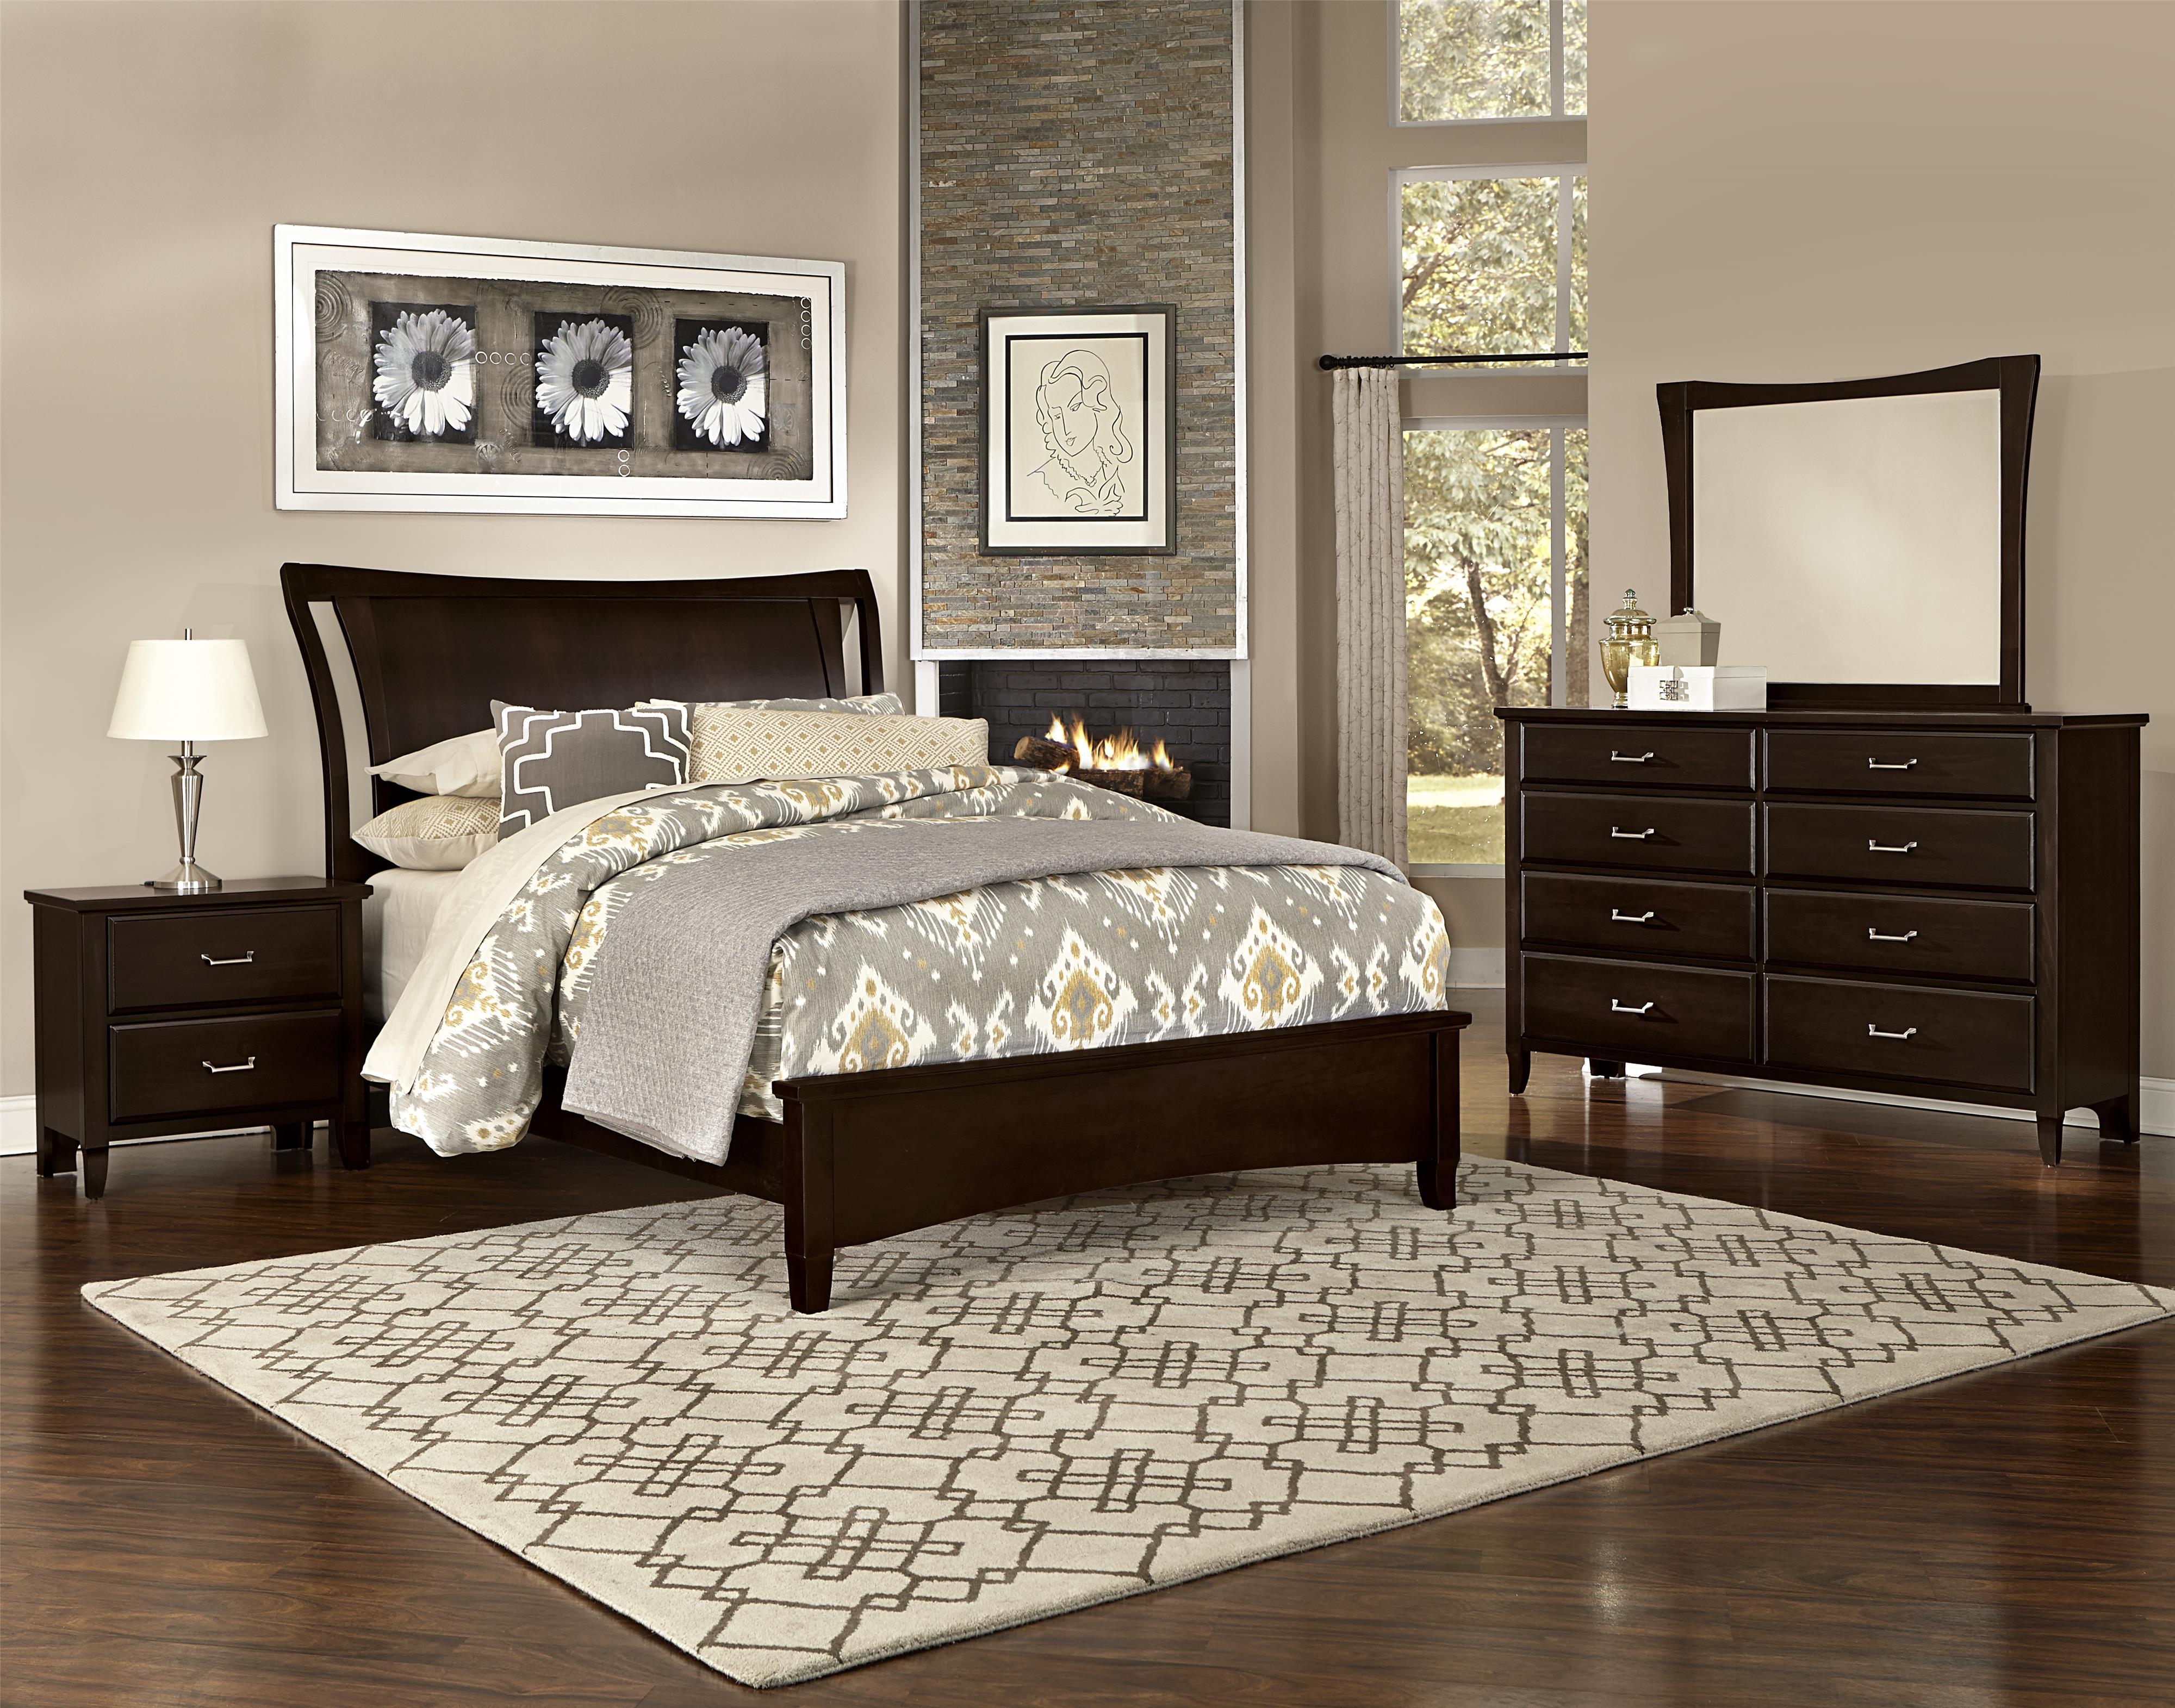 Vaughan Bassett Commentary King Bedroom Group - Item Number: 390 K Bedroom Group 1